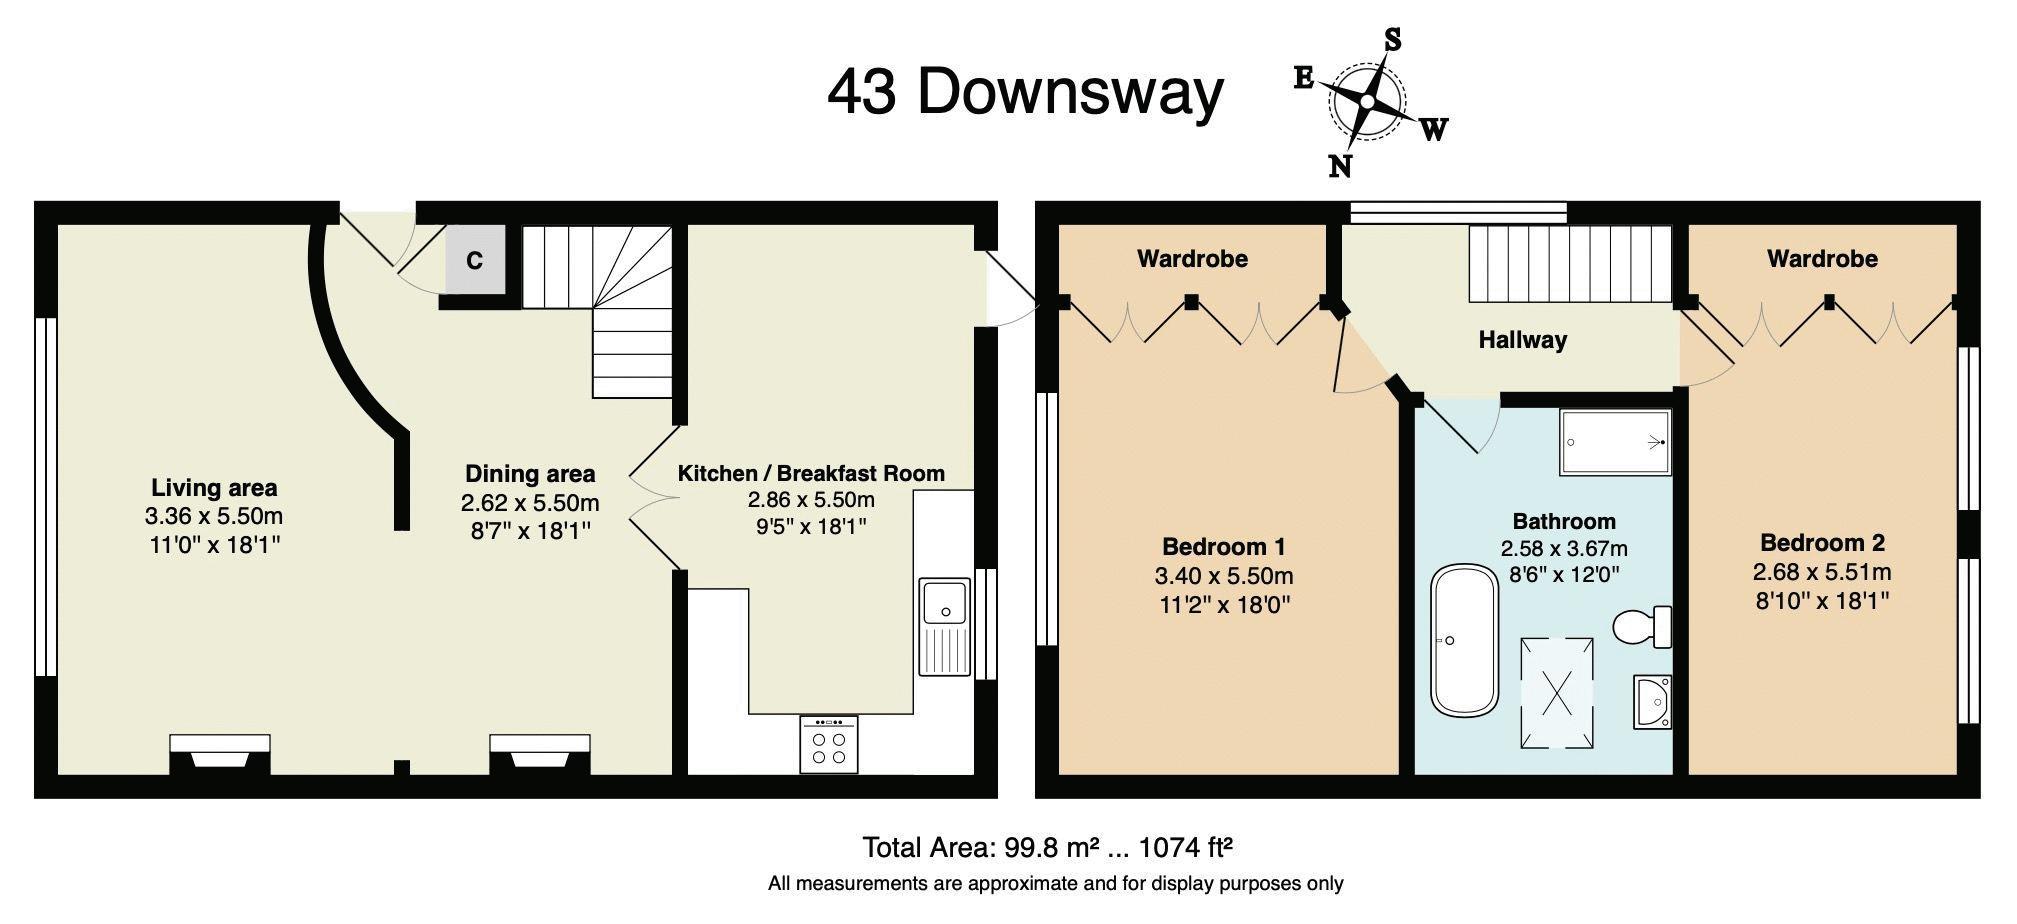 Downsway